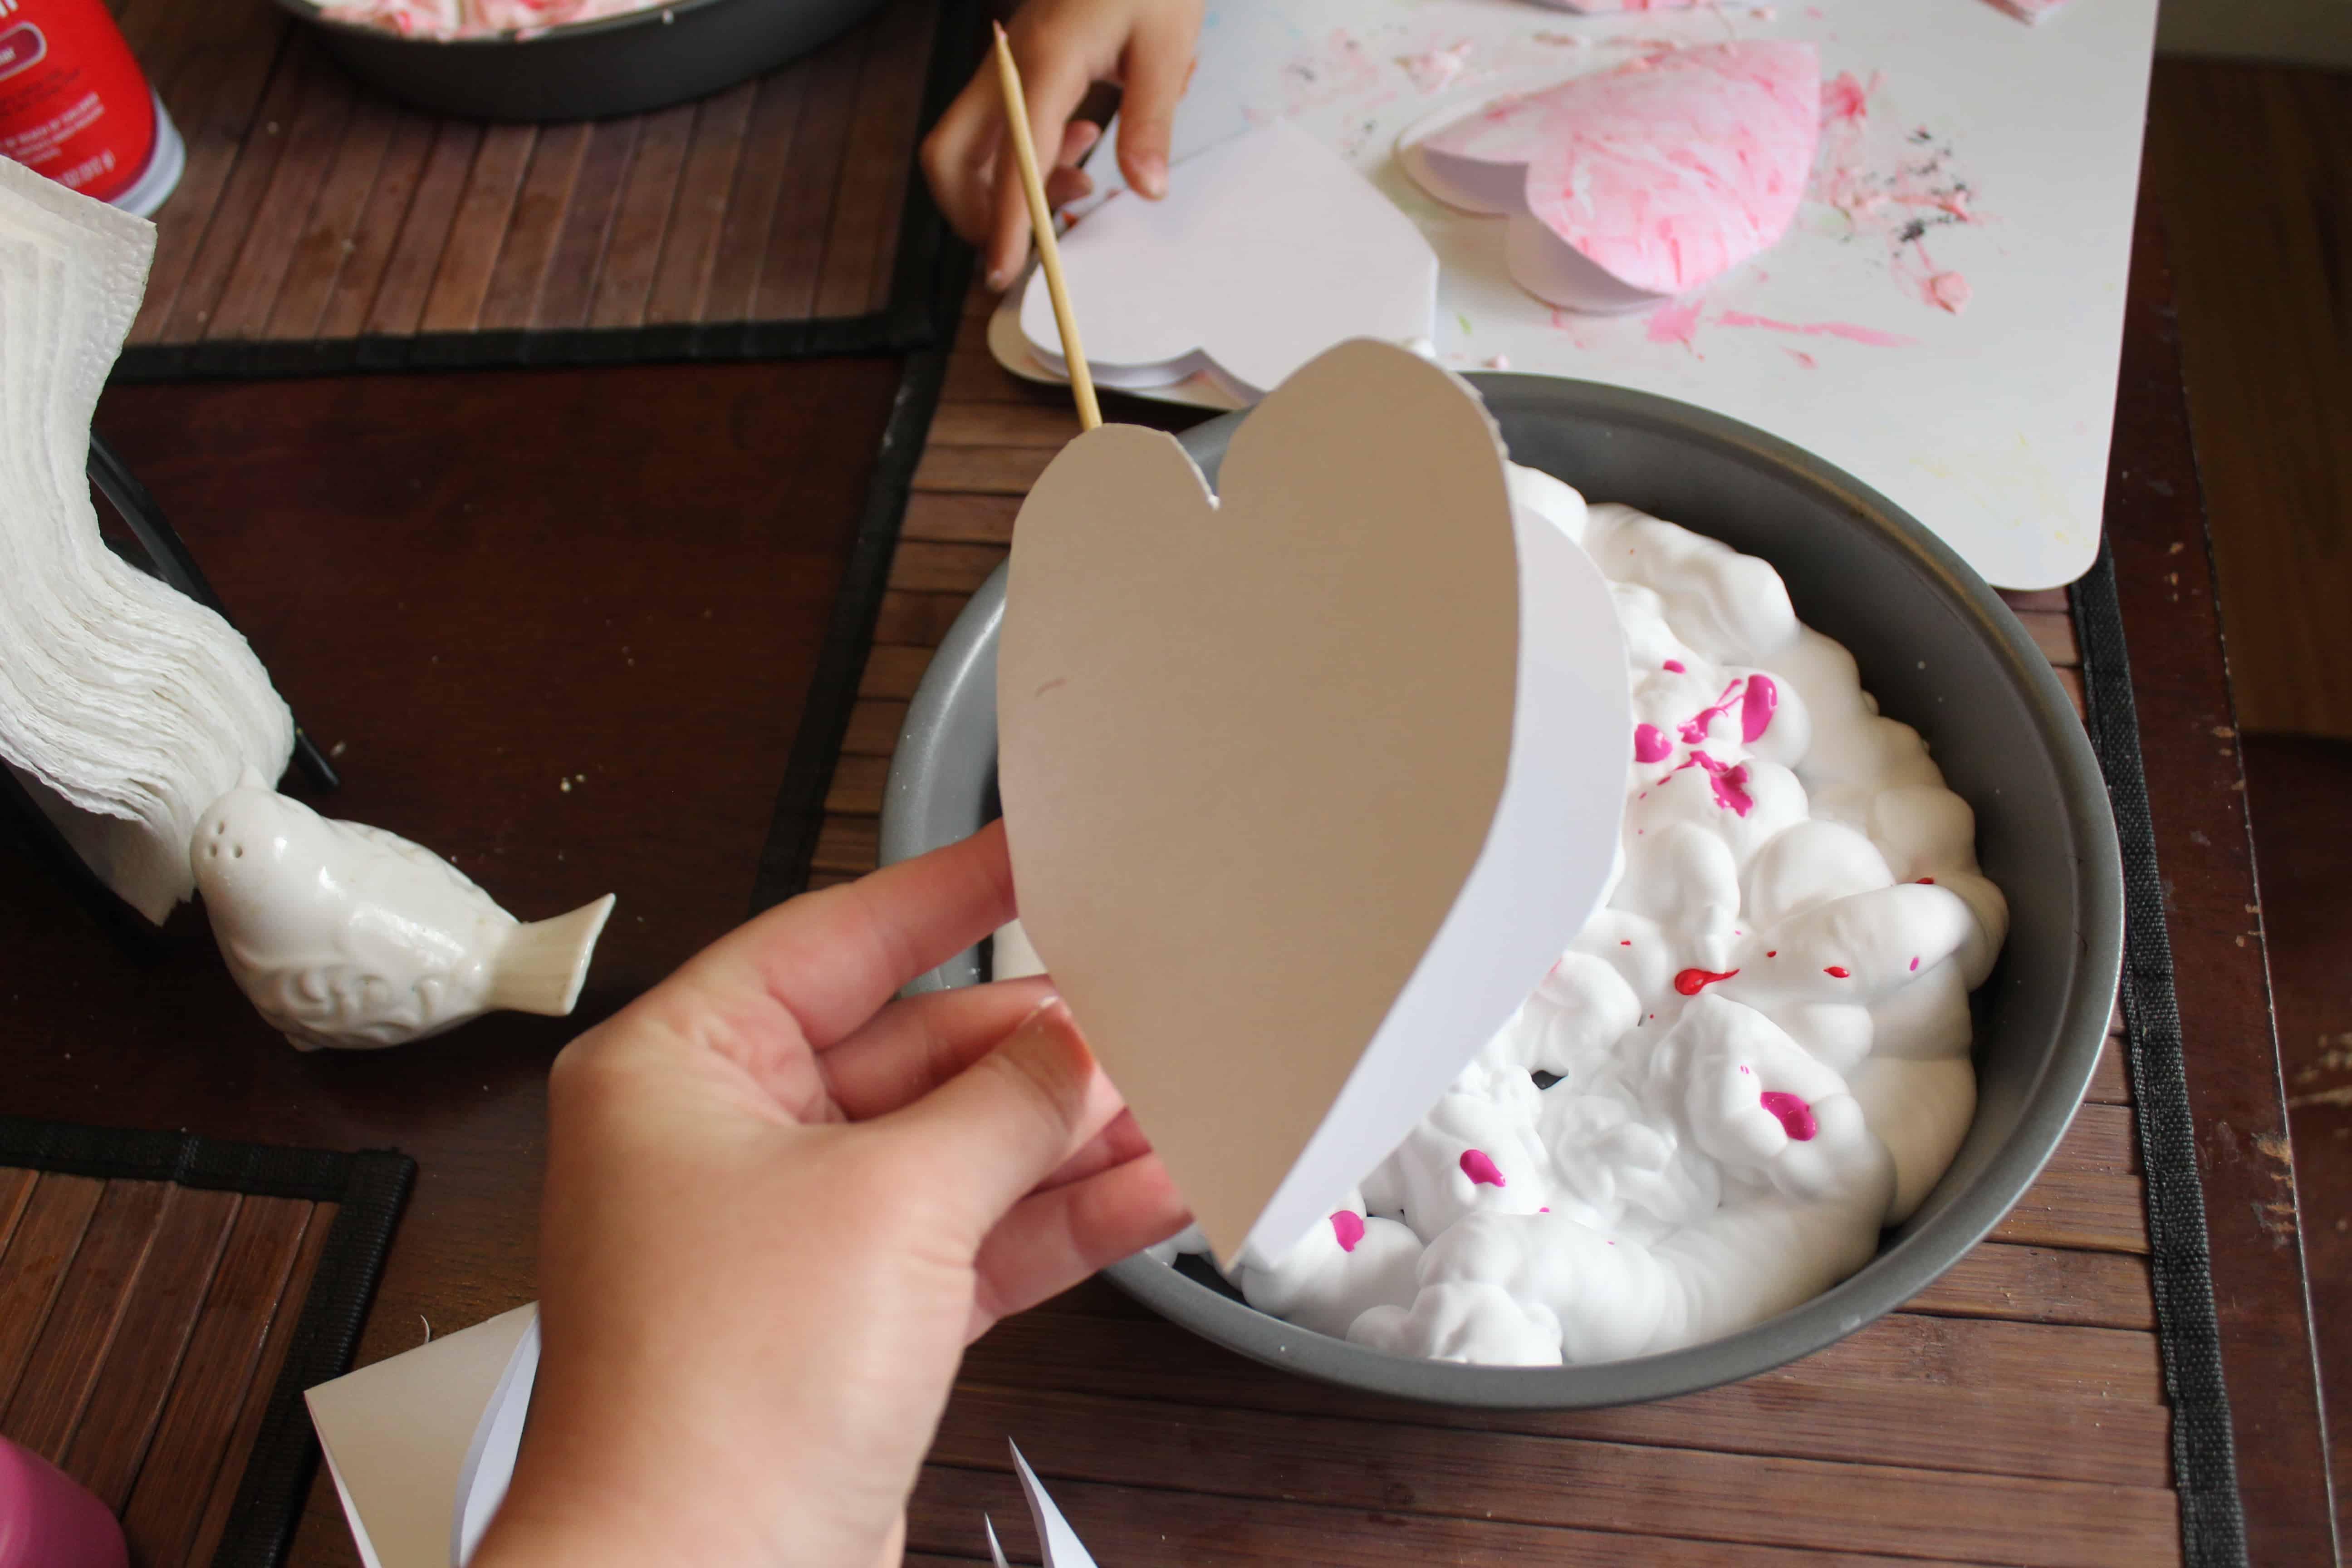 cardstock prints pressed into shaving cream paint